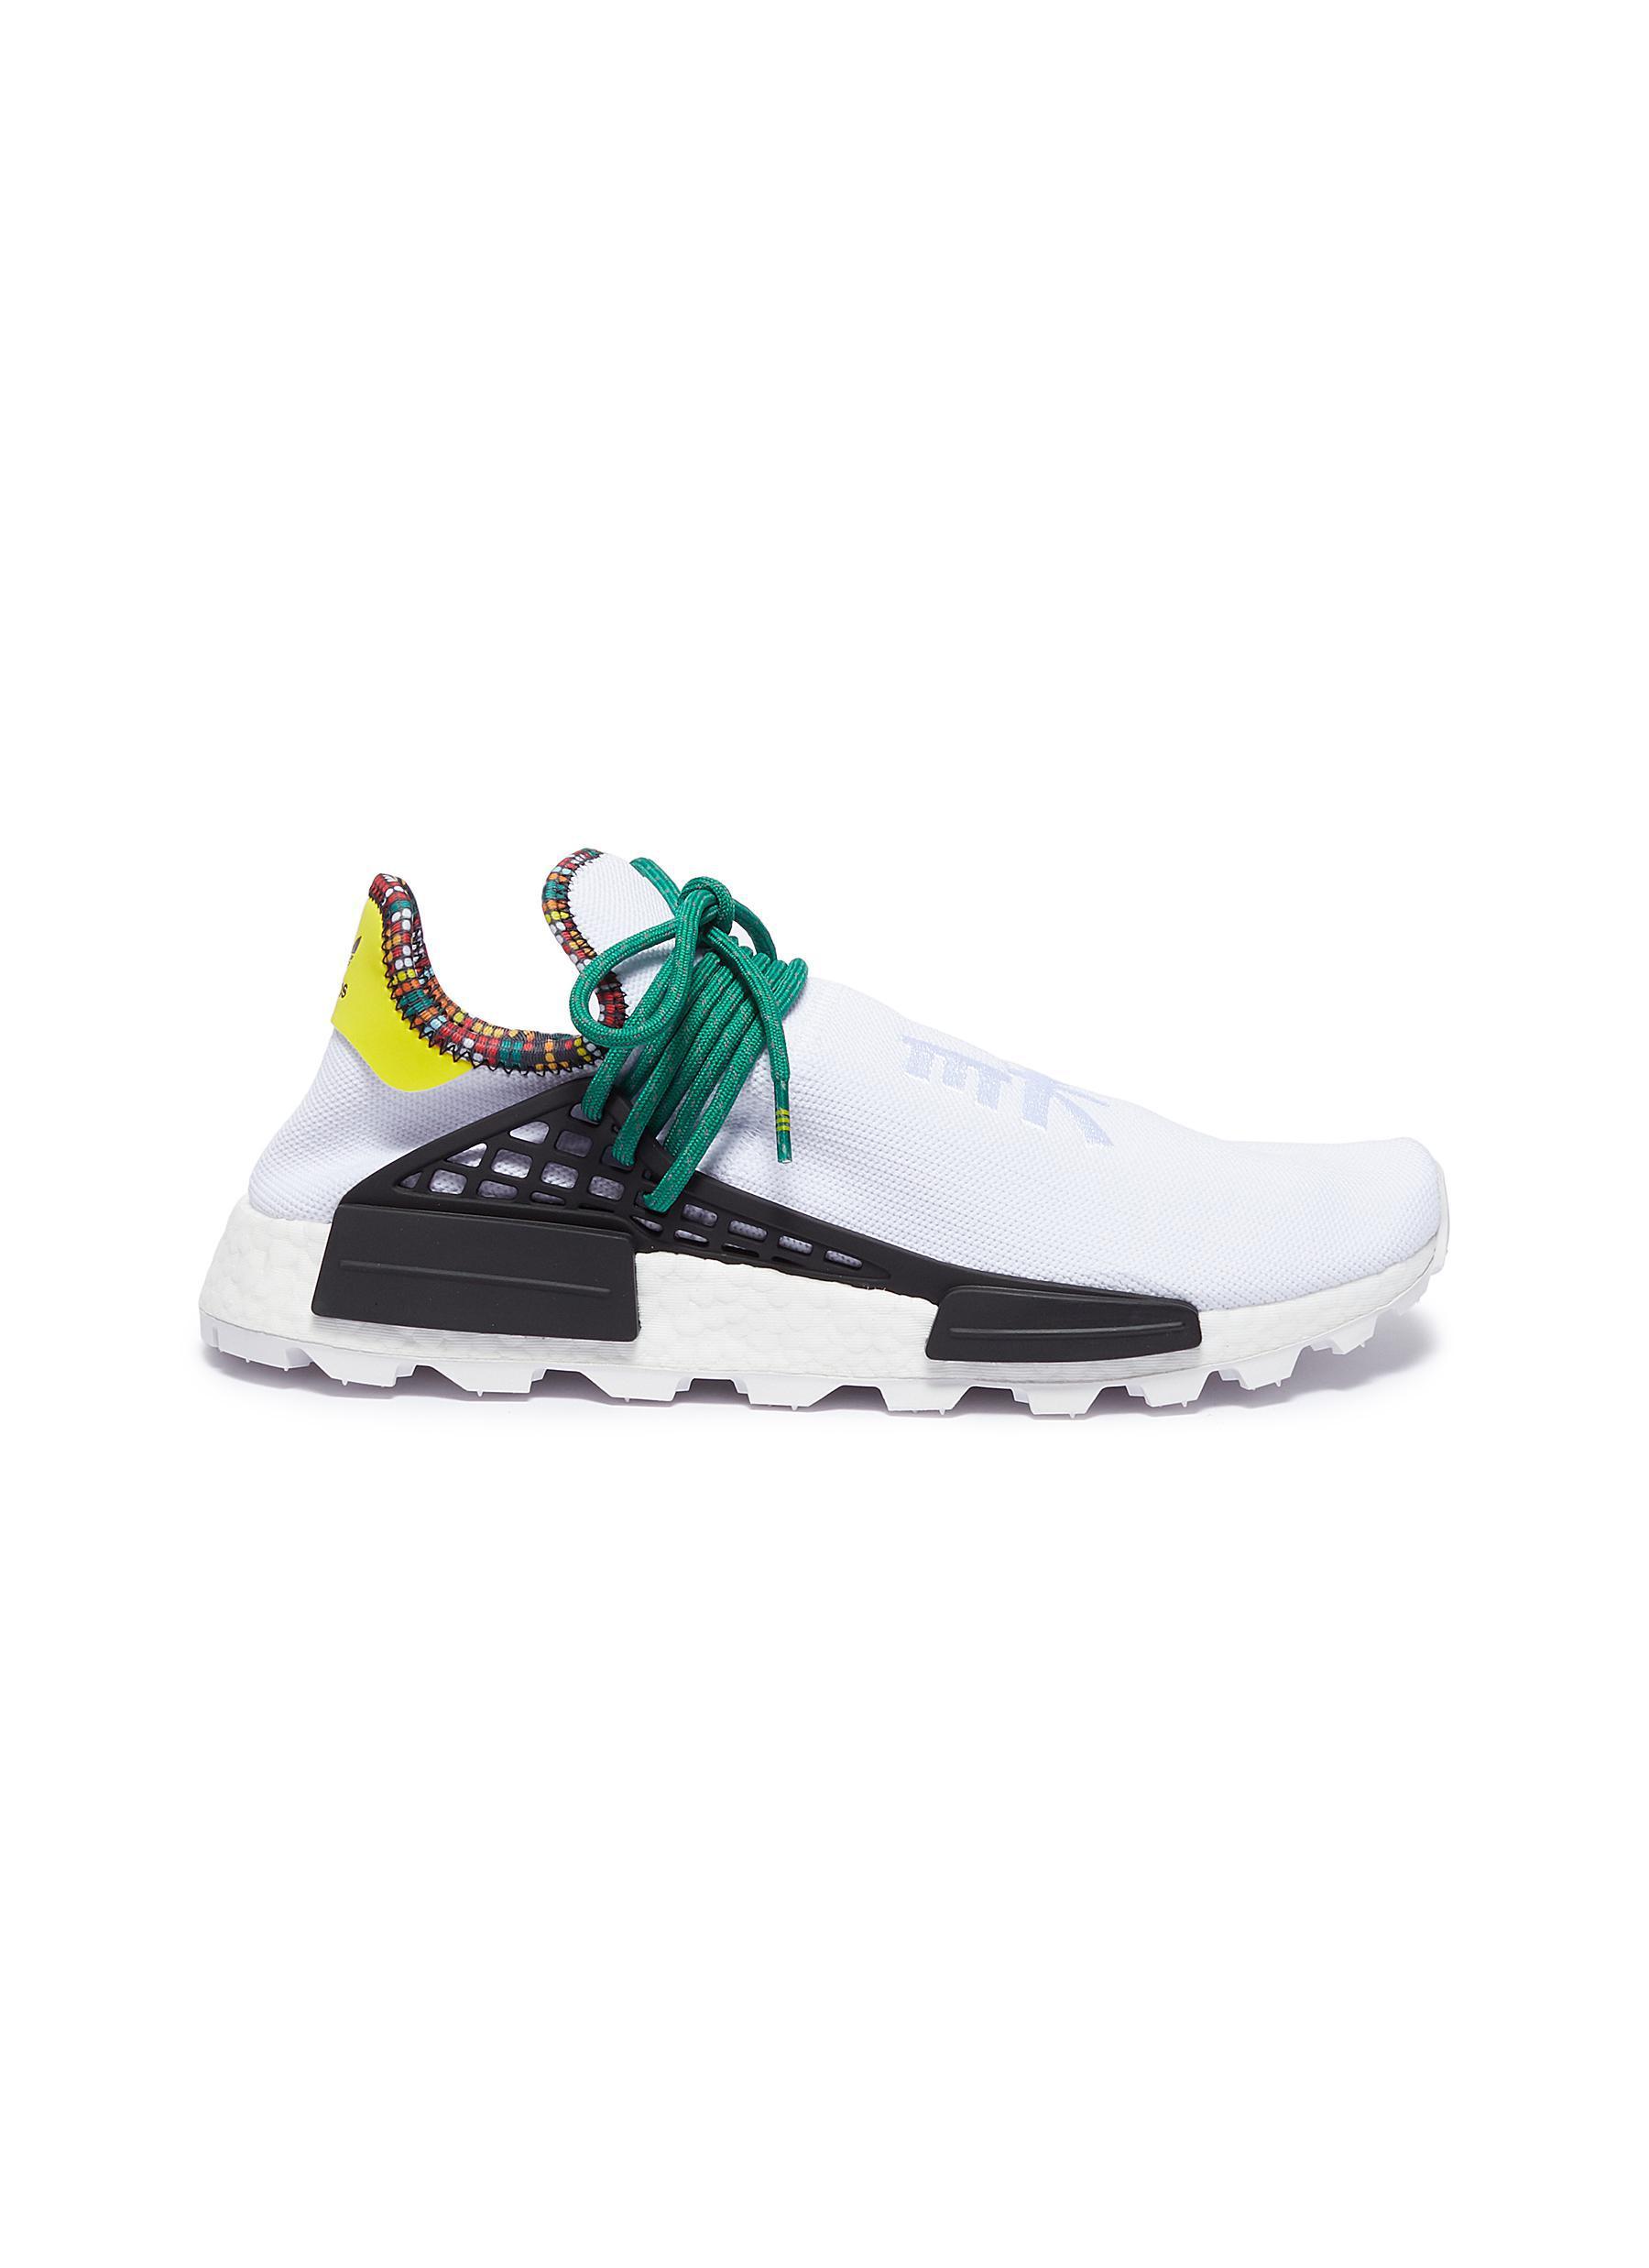 483f787f4be69 adidas Originals. Men s White  solarhu Nmd  Slogan Embroidered Primeknit  Sneakers